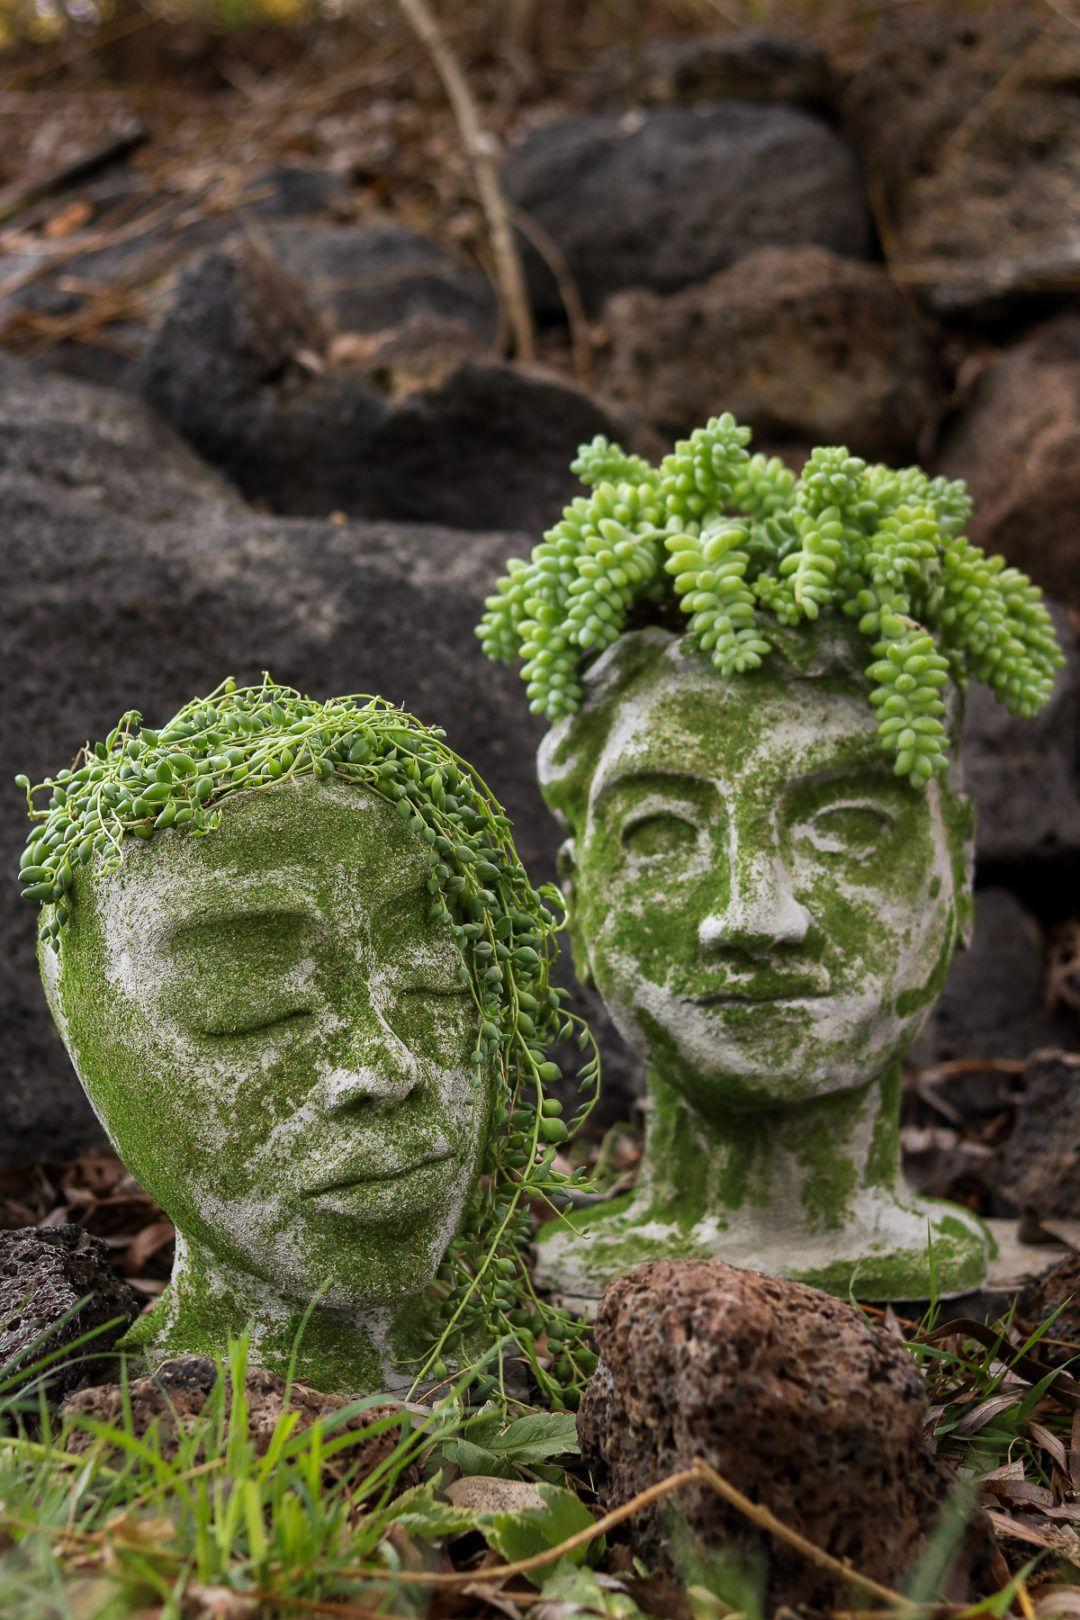 Diy Head Planter Using Concrete Garden Diys With Images 640 x 480